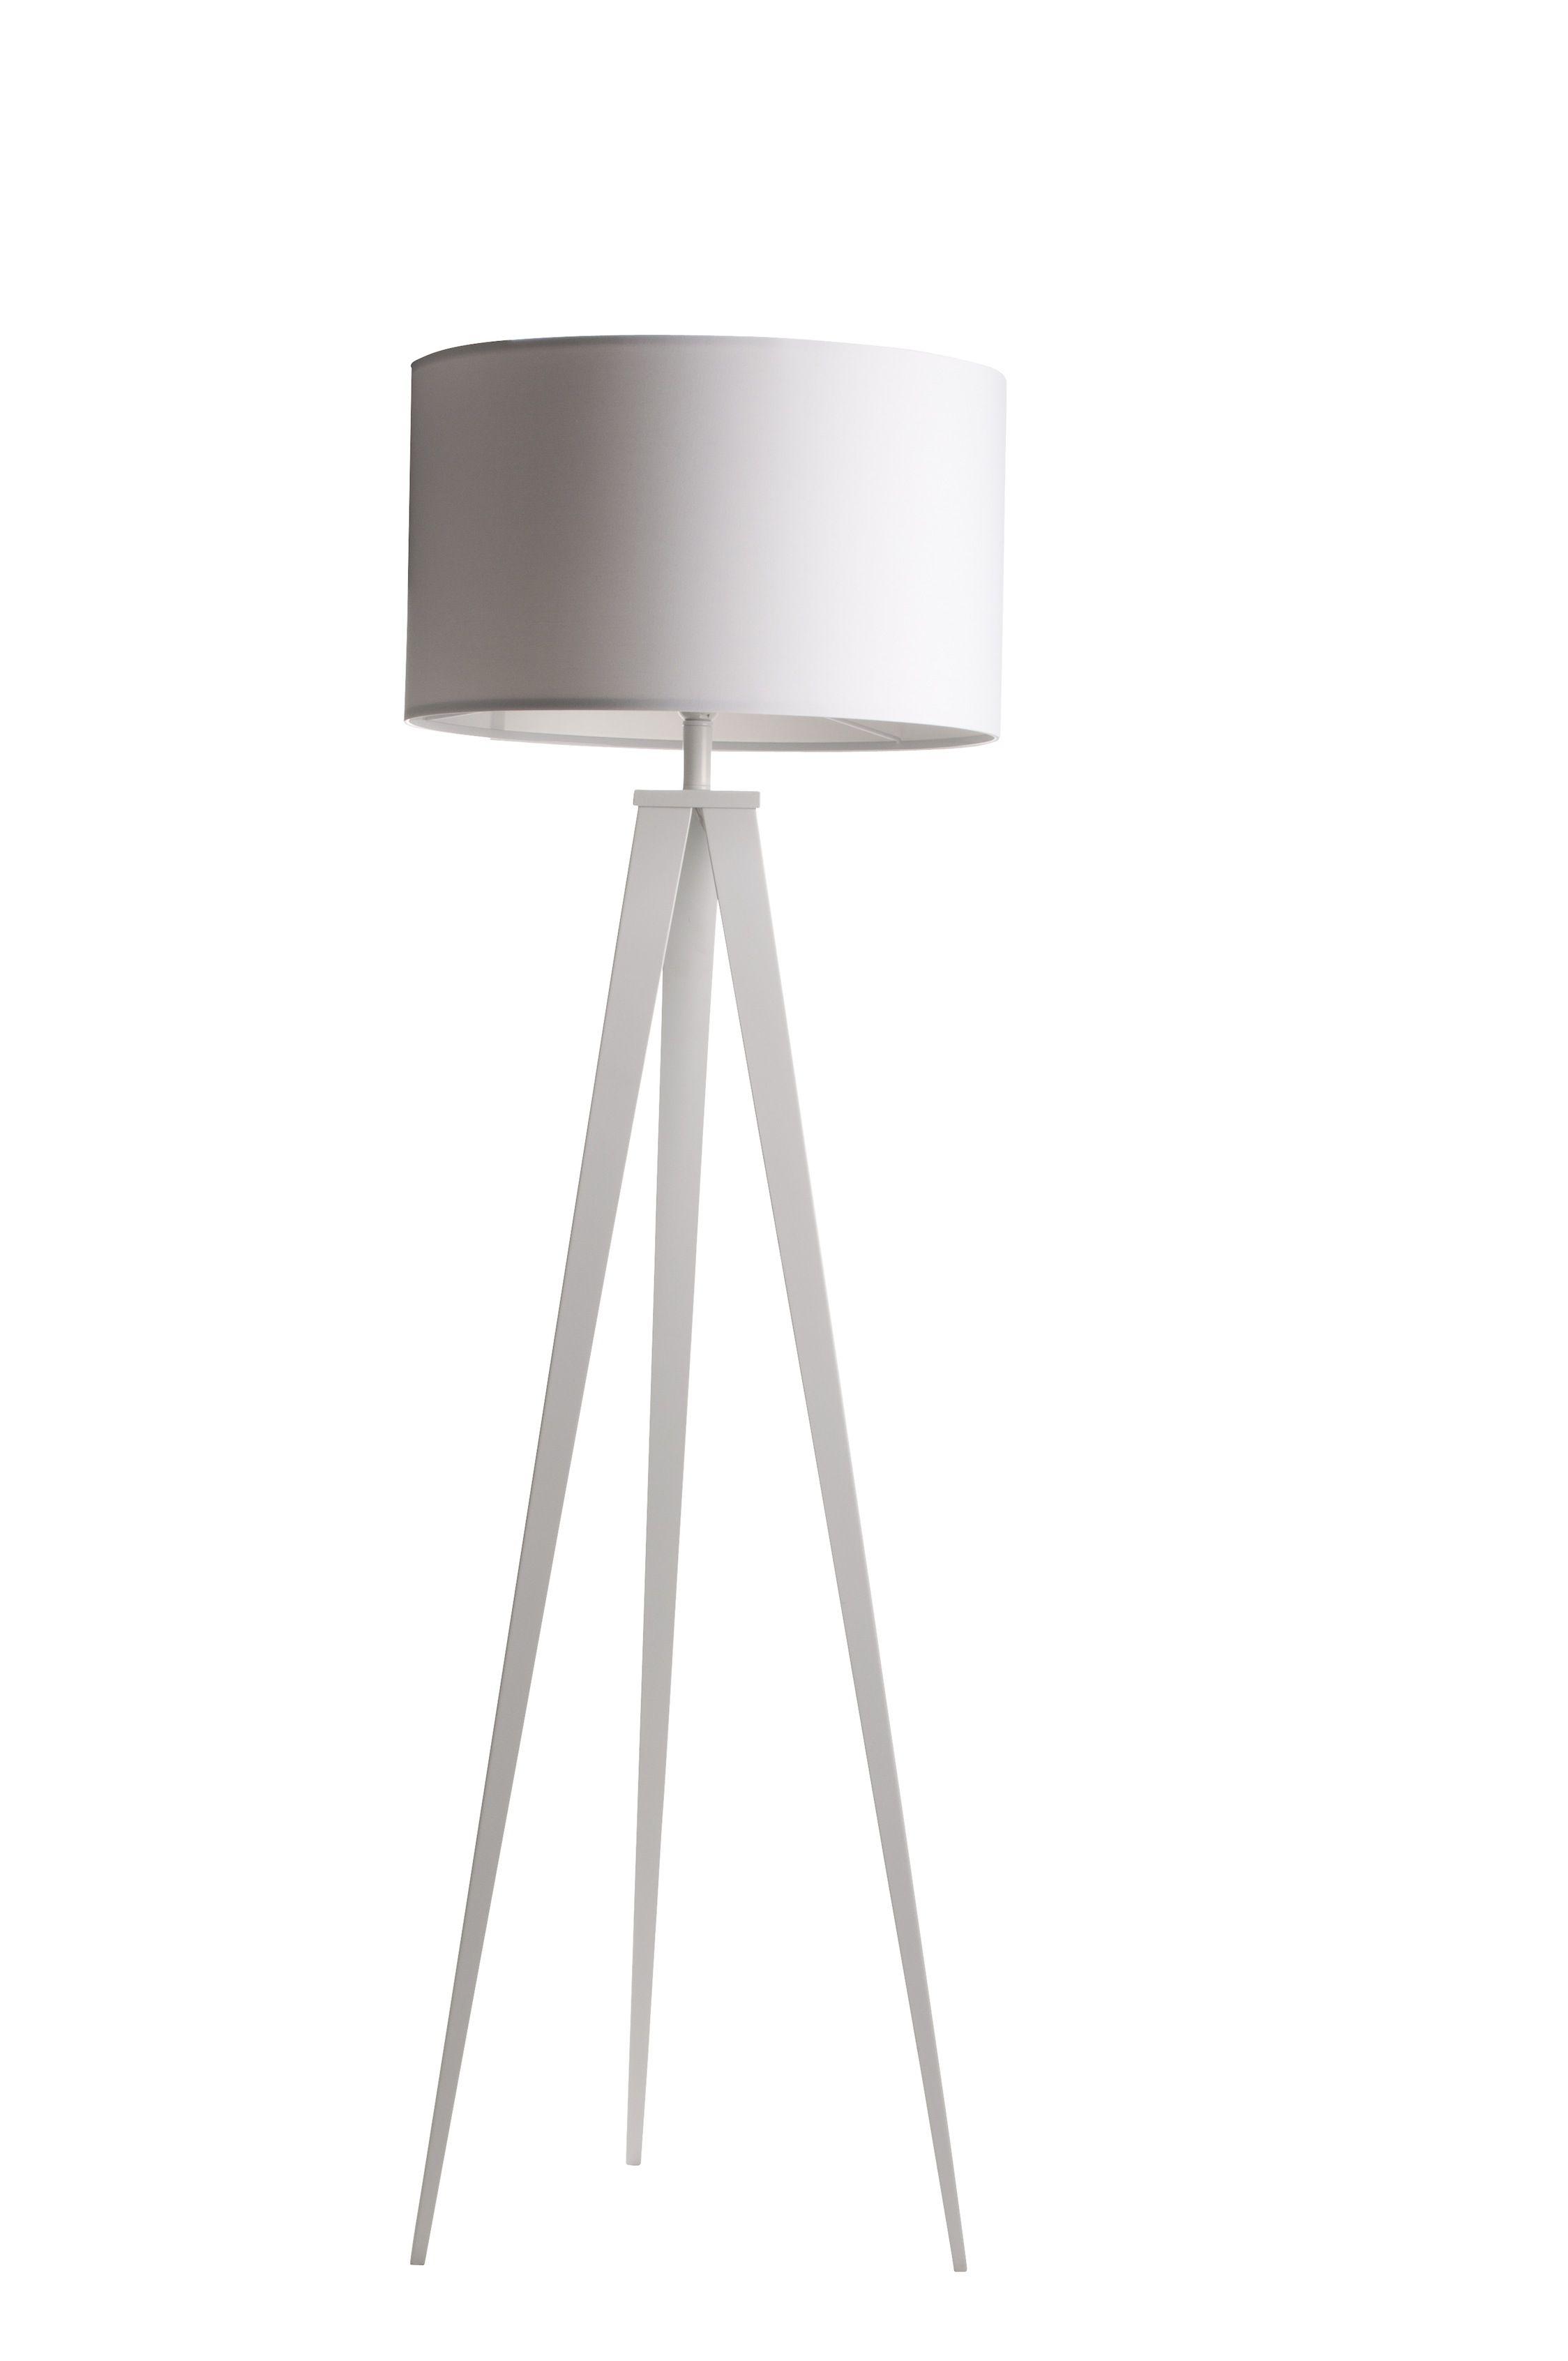 Zuiver Lampa Podlogowa Tripod White Another Design Lampa Podlogowa Lampy Lampa Na Biurko